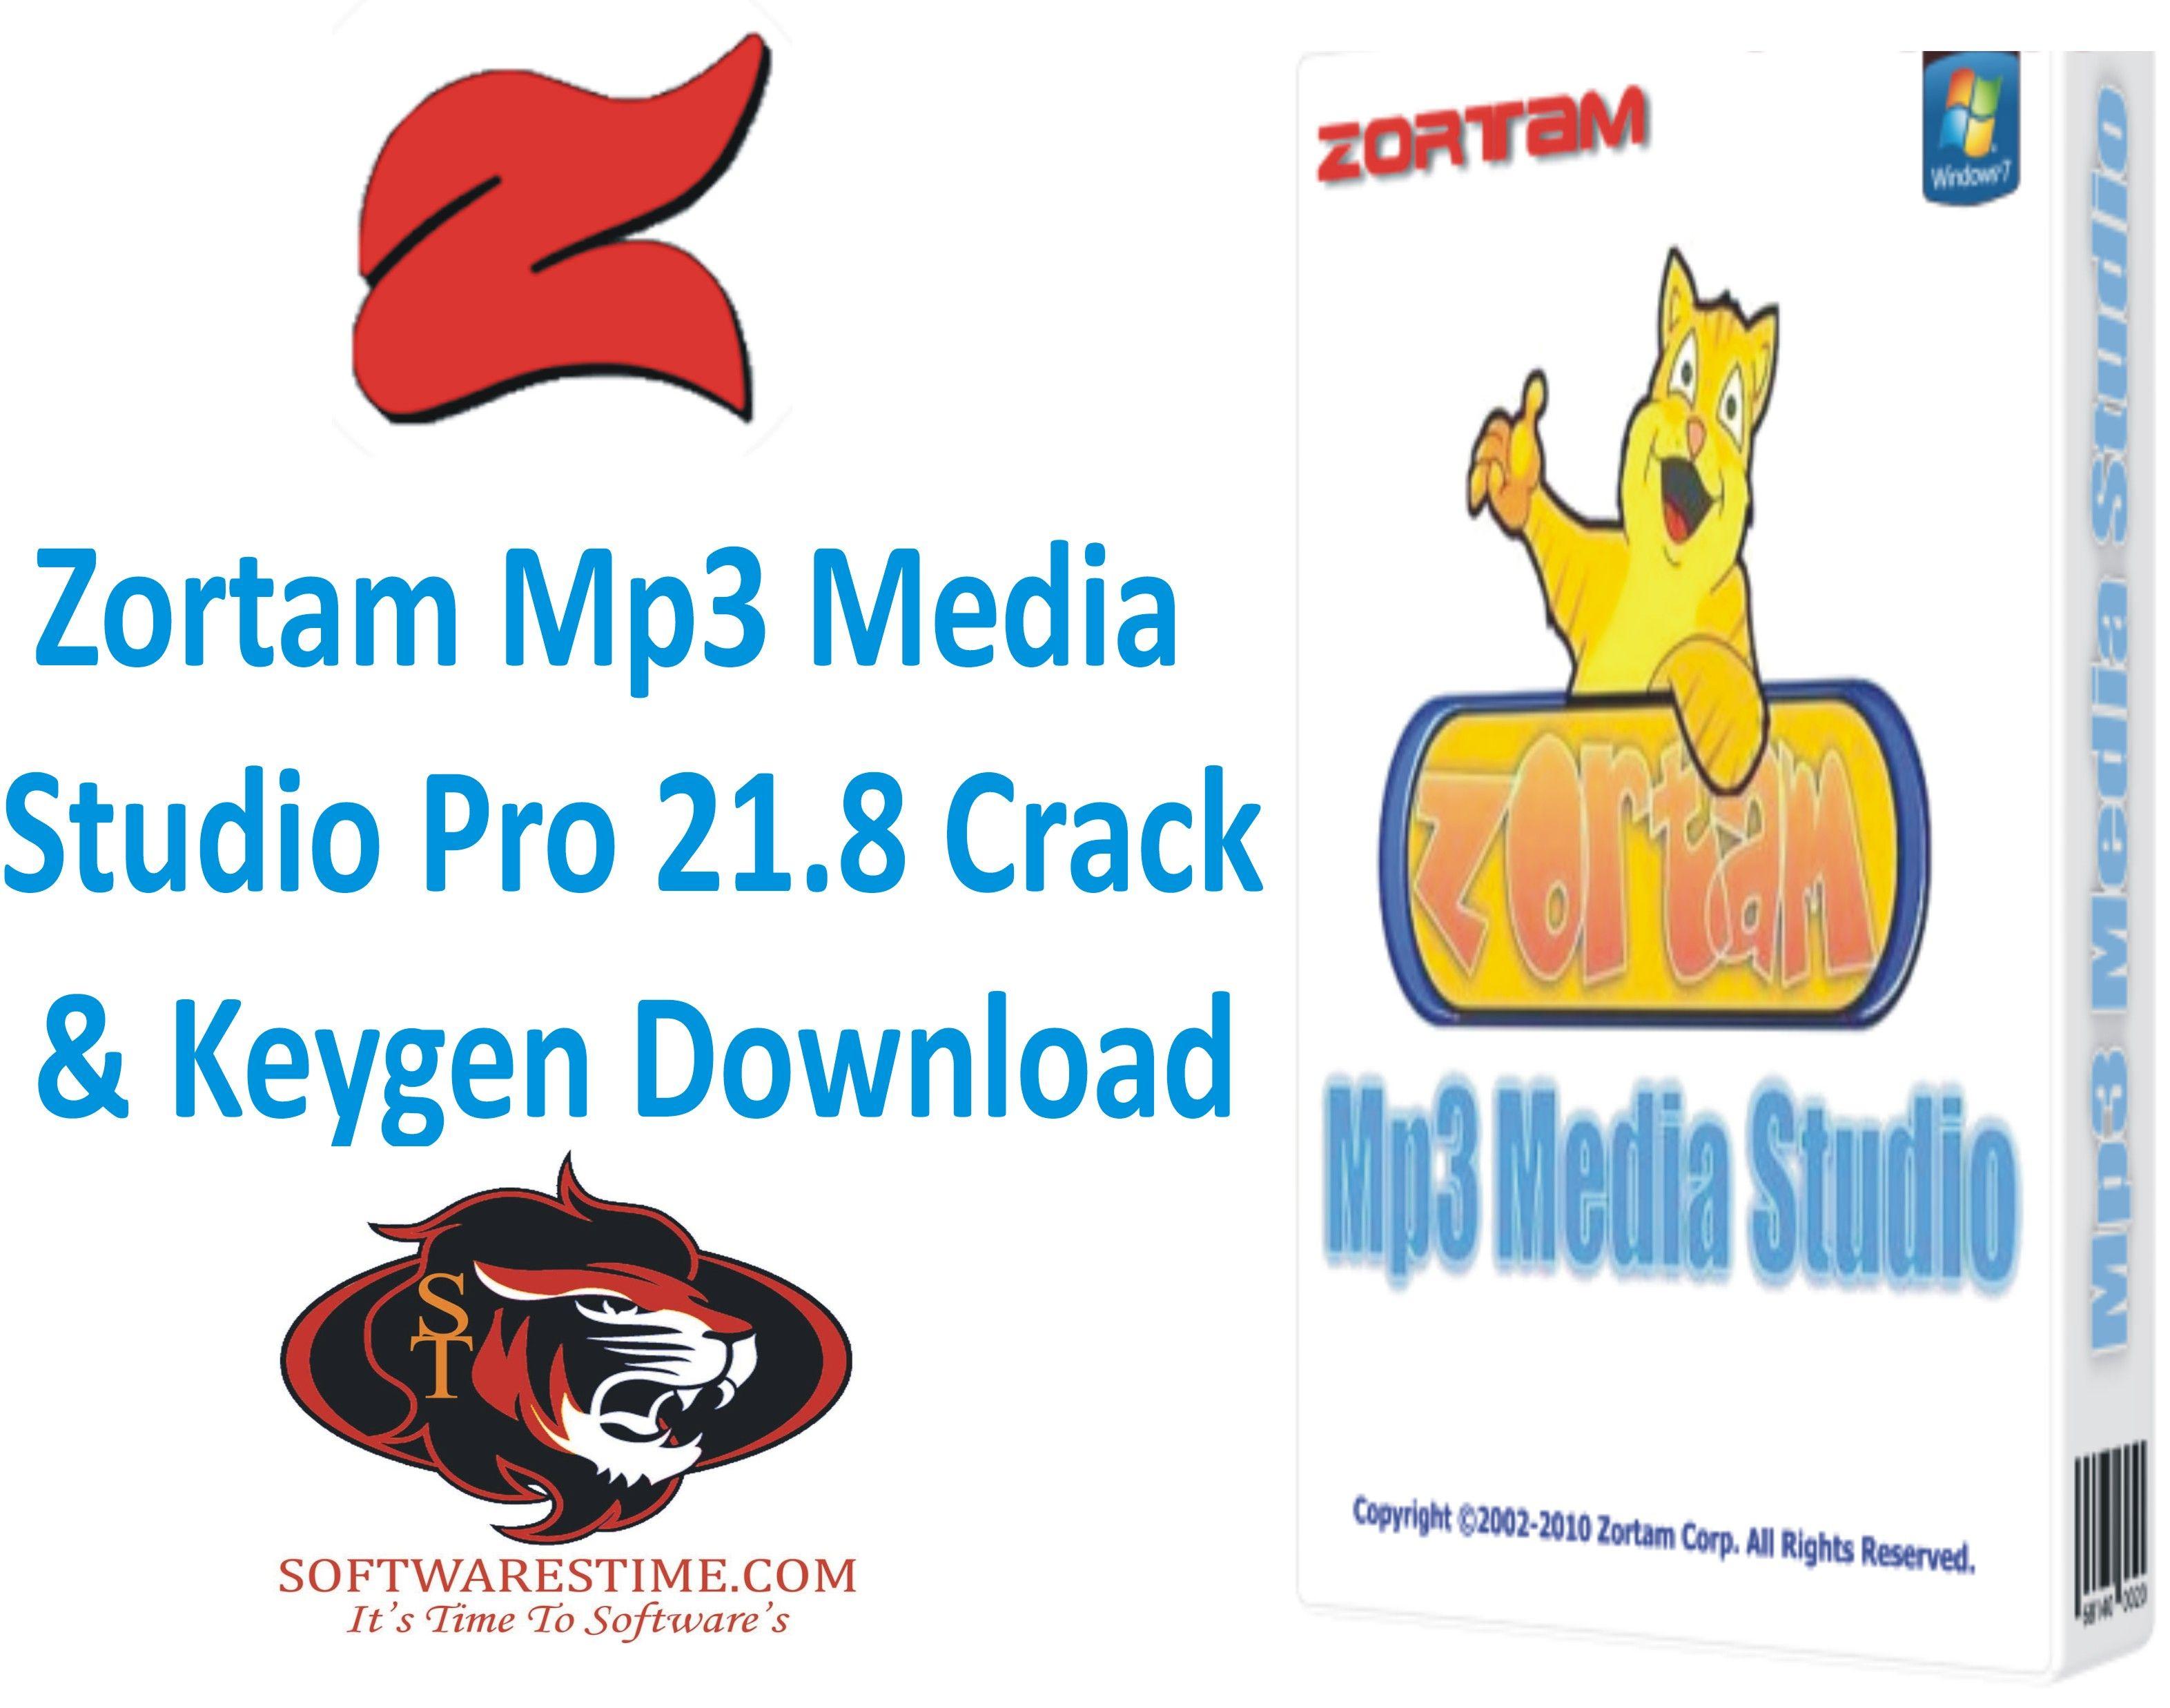 Ulead photoimpact x3 13.0.0 keygen h33t cazor Ulead photoimpact x3 1300 keygen - torrents file